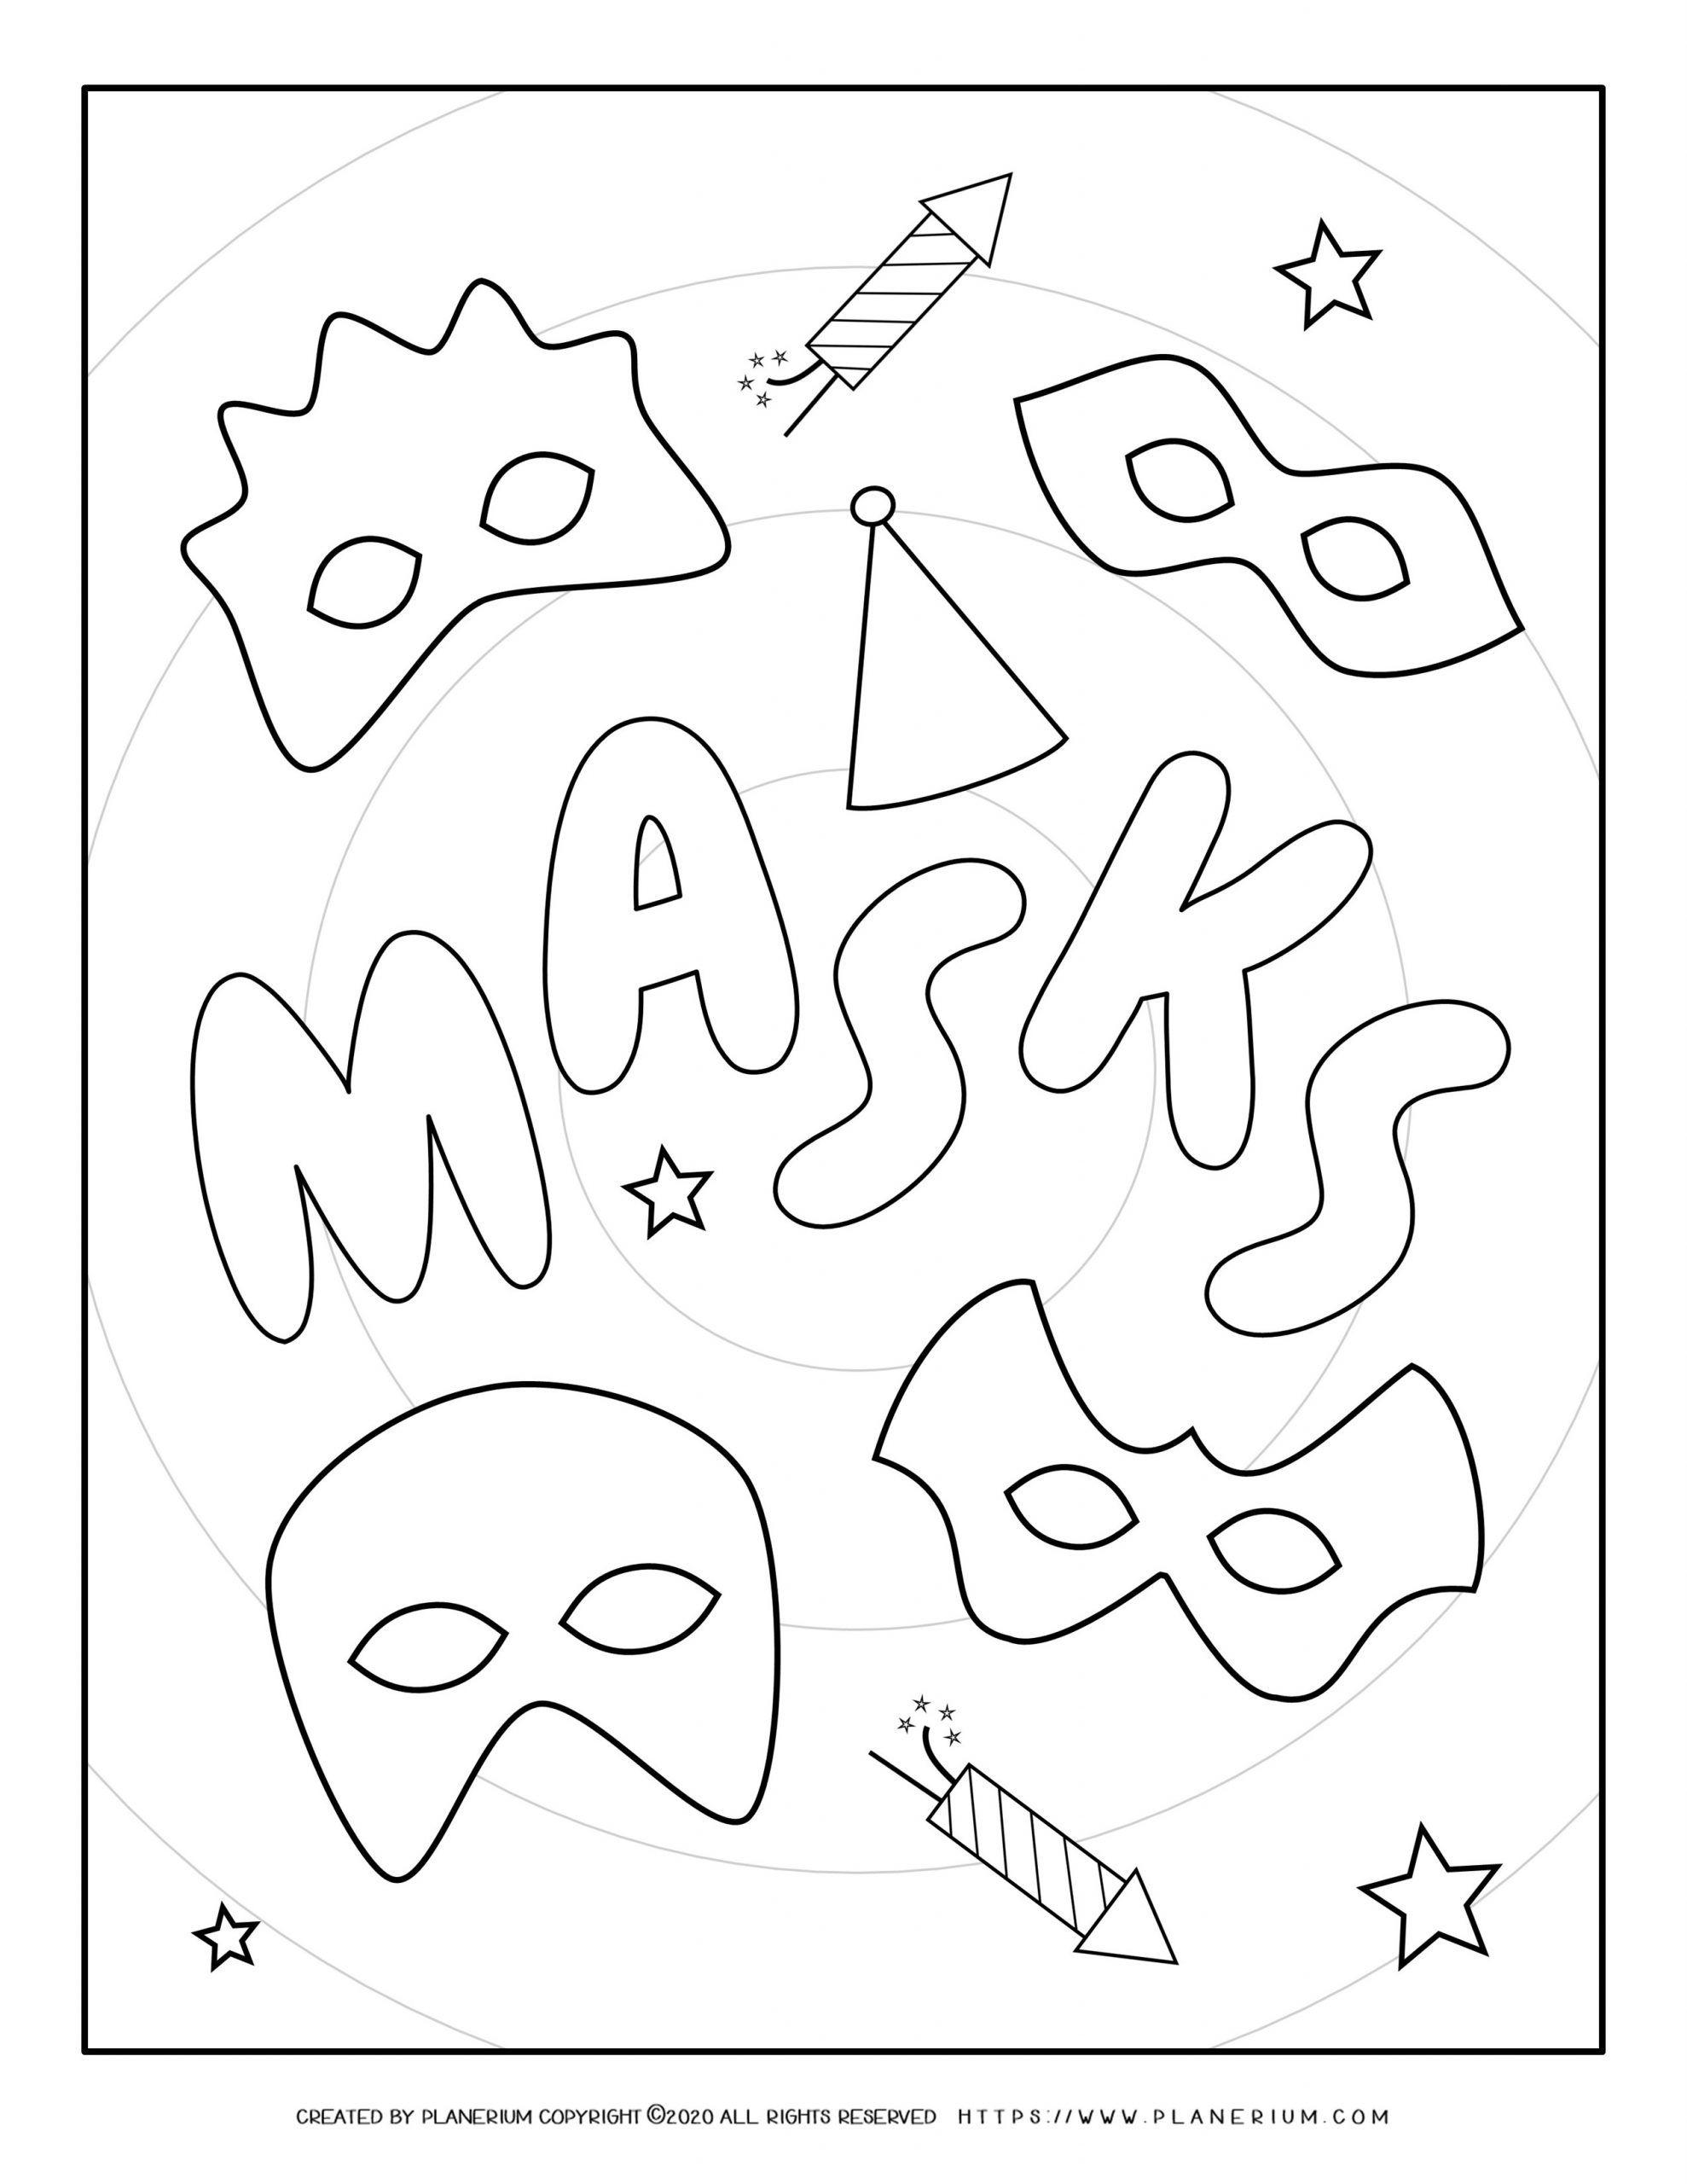 Carnival - Coloring Pages Worksheets - Masks Poster | Planerium